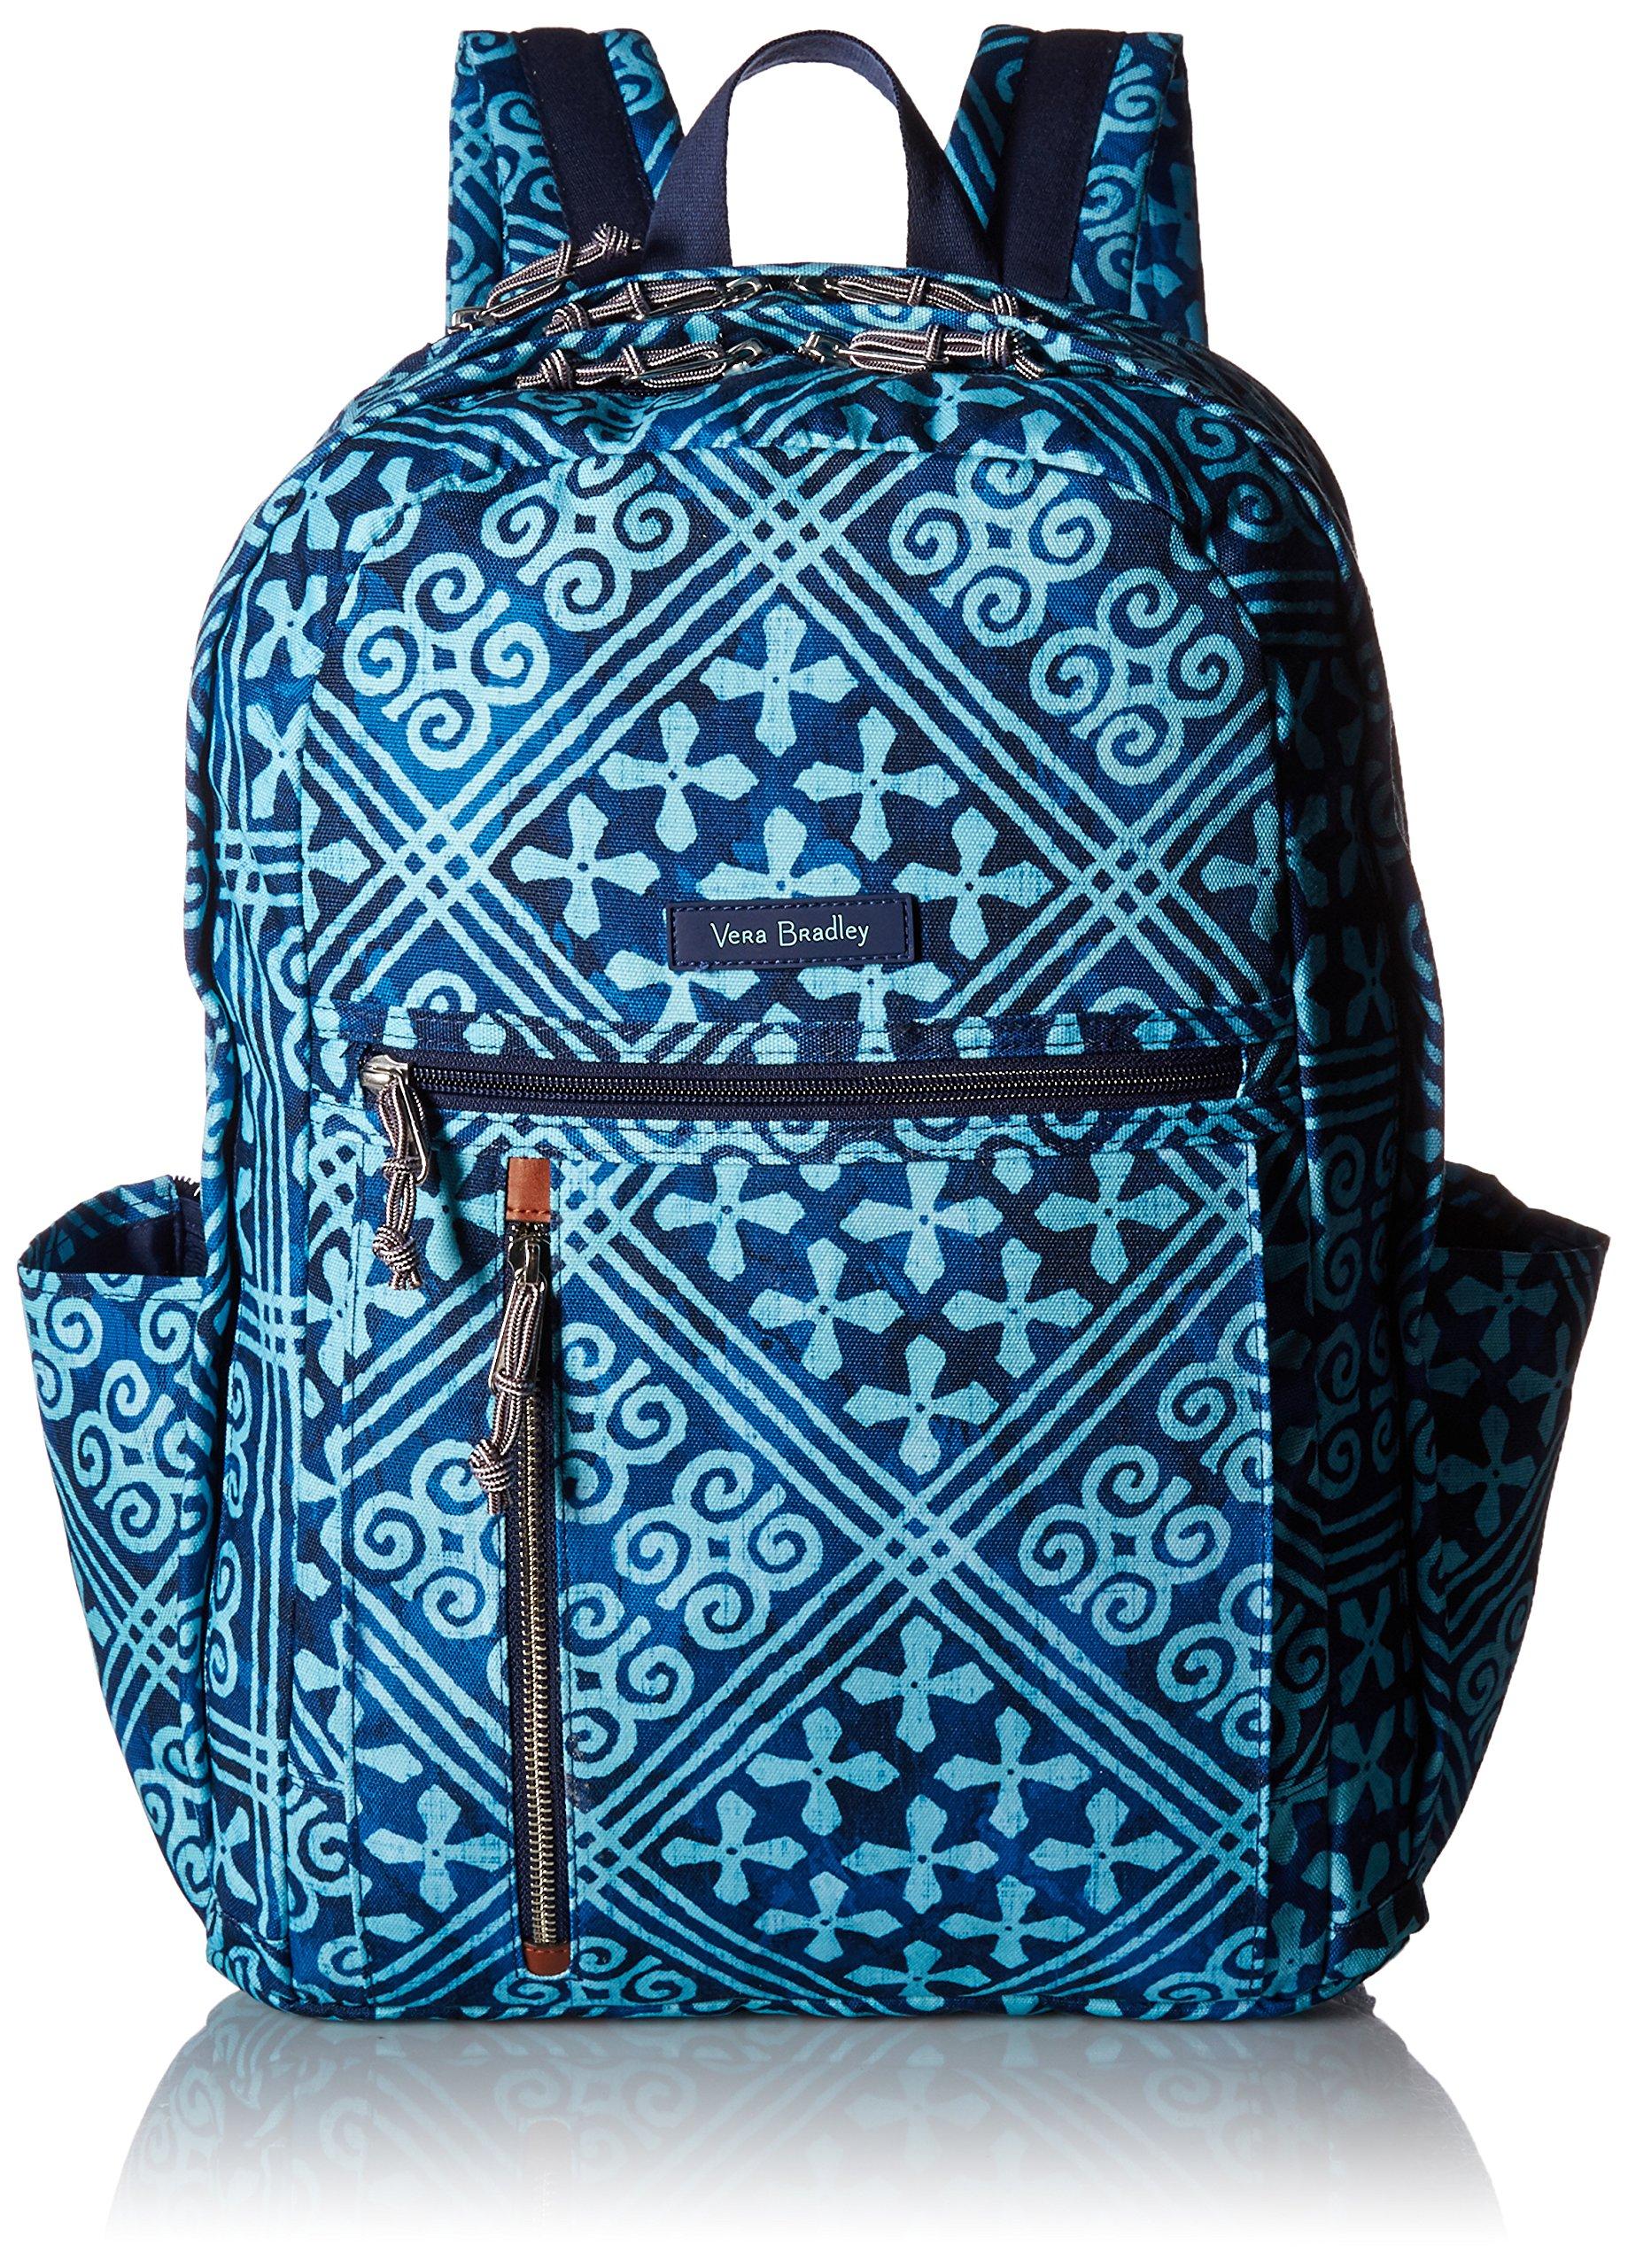 Vera Bradley Women's Grand Backpack Cotton, Cuban Tiles